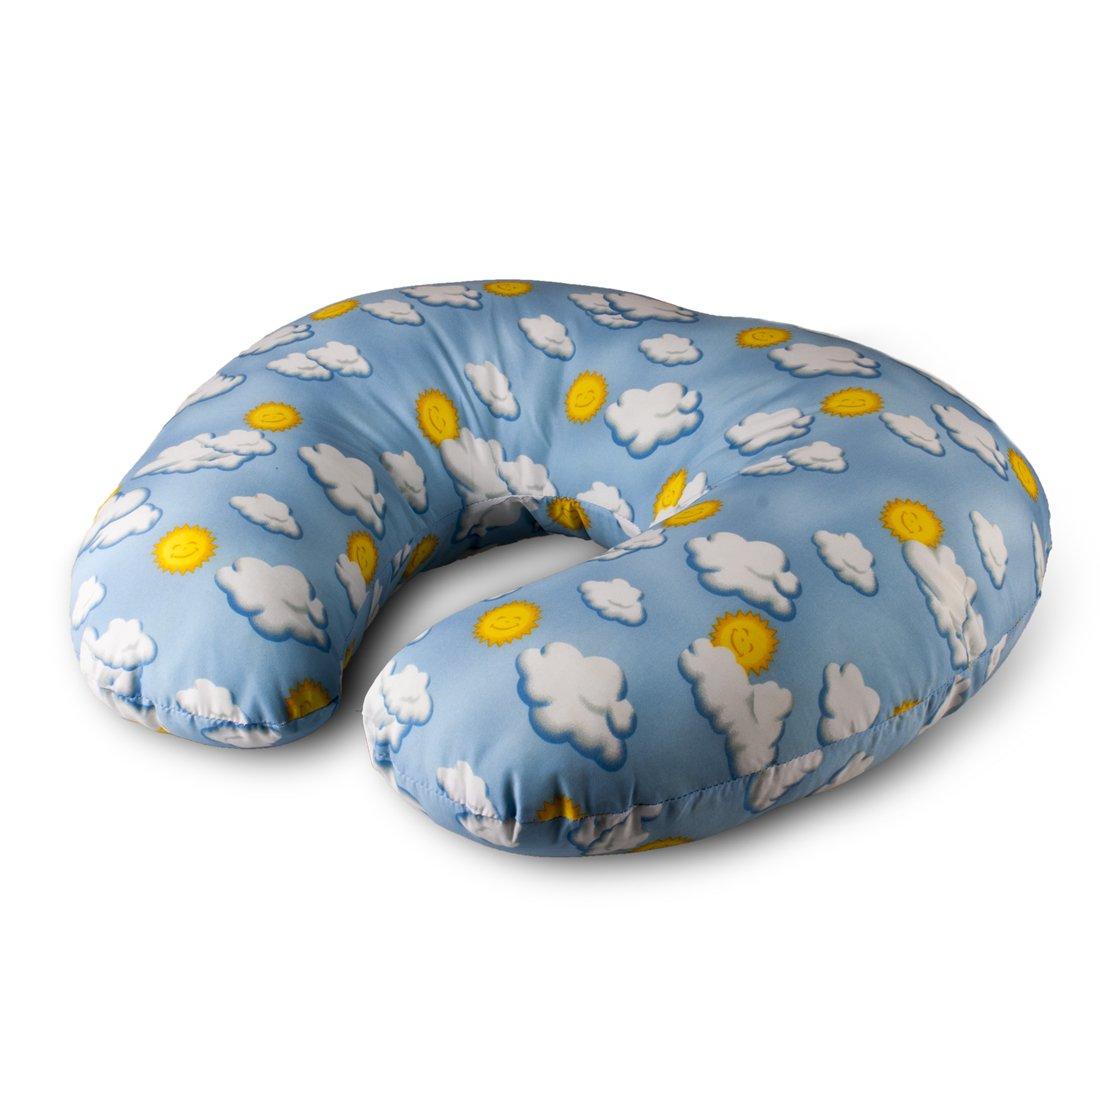 NurSit Basic Nursing Pillow, Stripe Print 2400 STRIPE